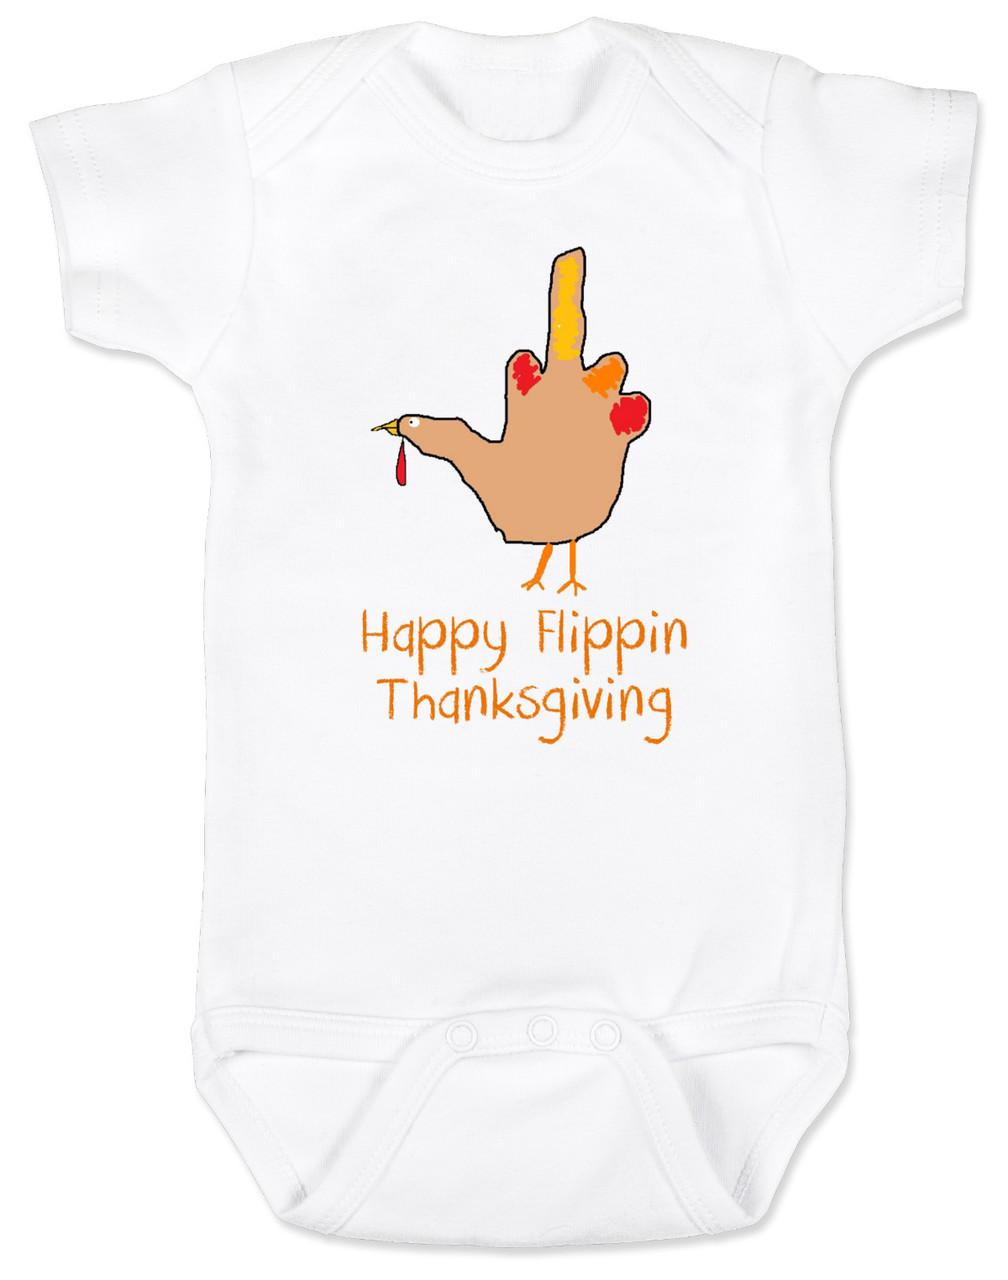 Thanksgiving Baby One-piece Cute Thanksgiving Baby Gift I/'m Definitely A Leg Man Funny Thanksgiving Baby Bodysuit